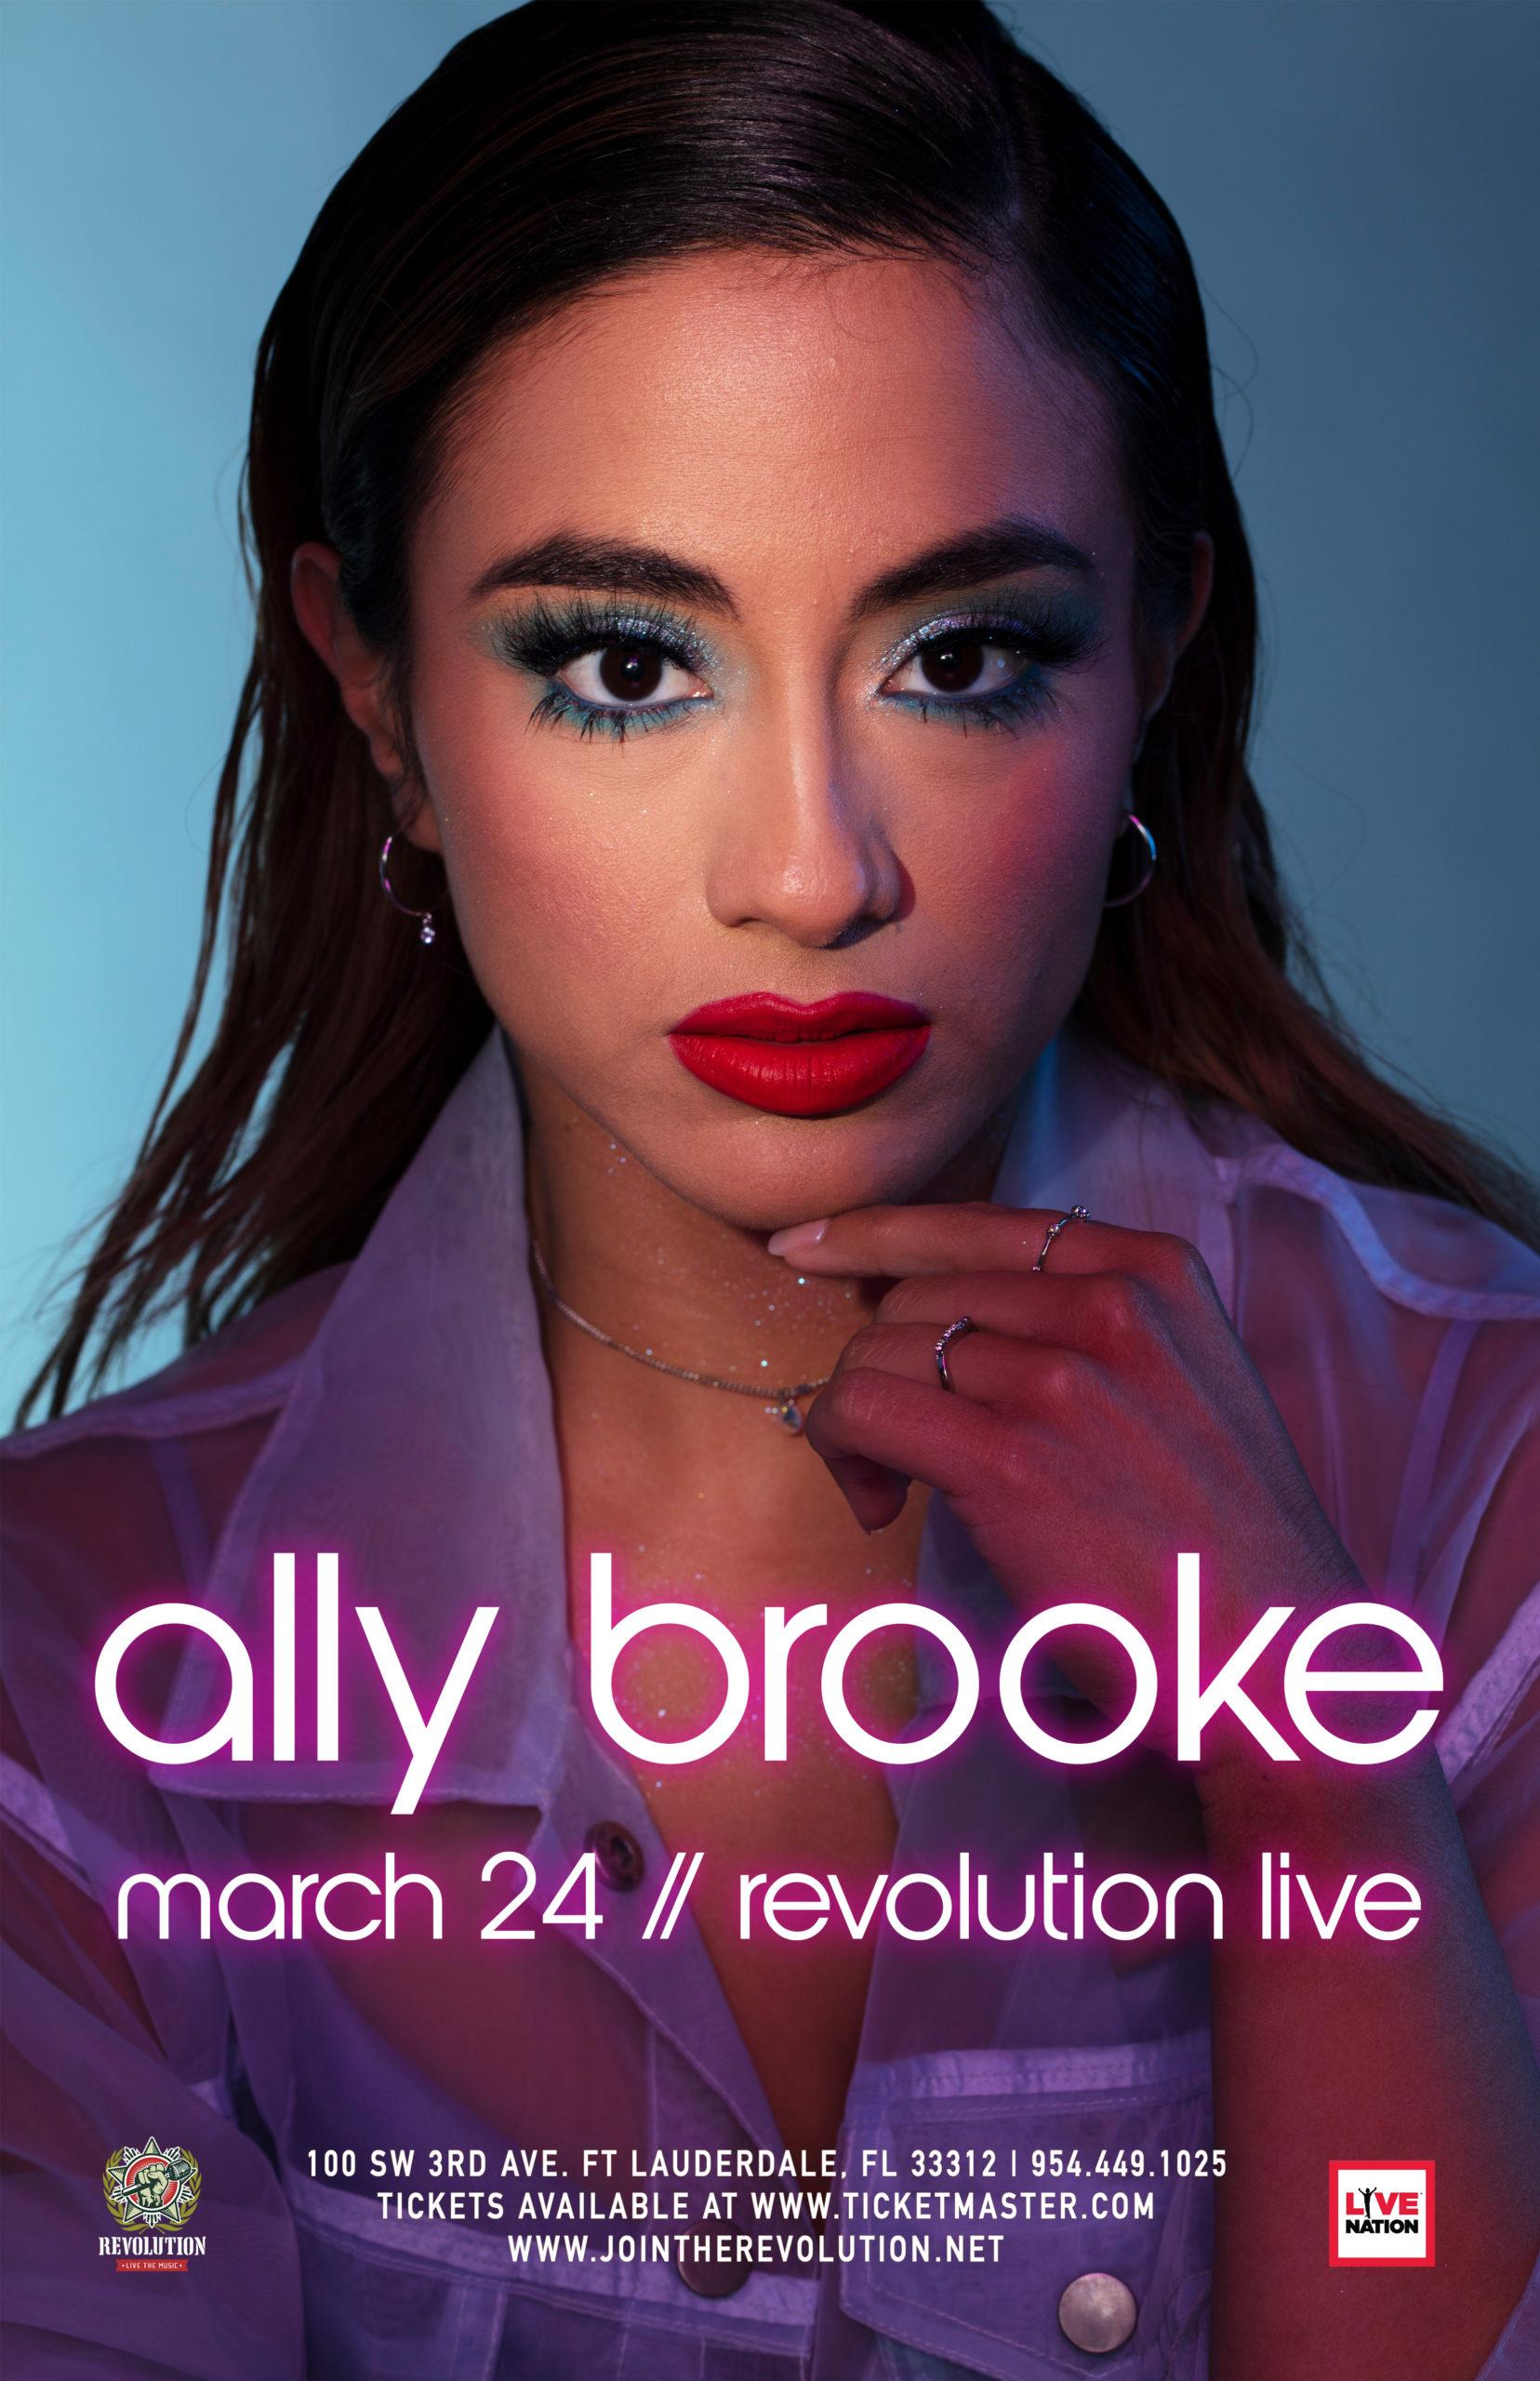 Ally Brooke - POSTPONED